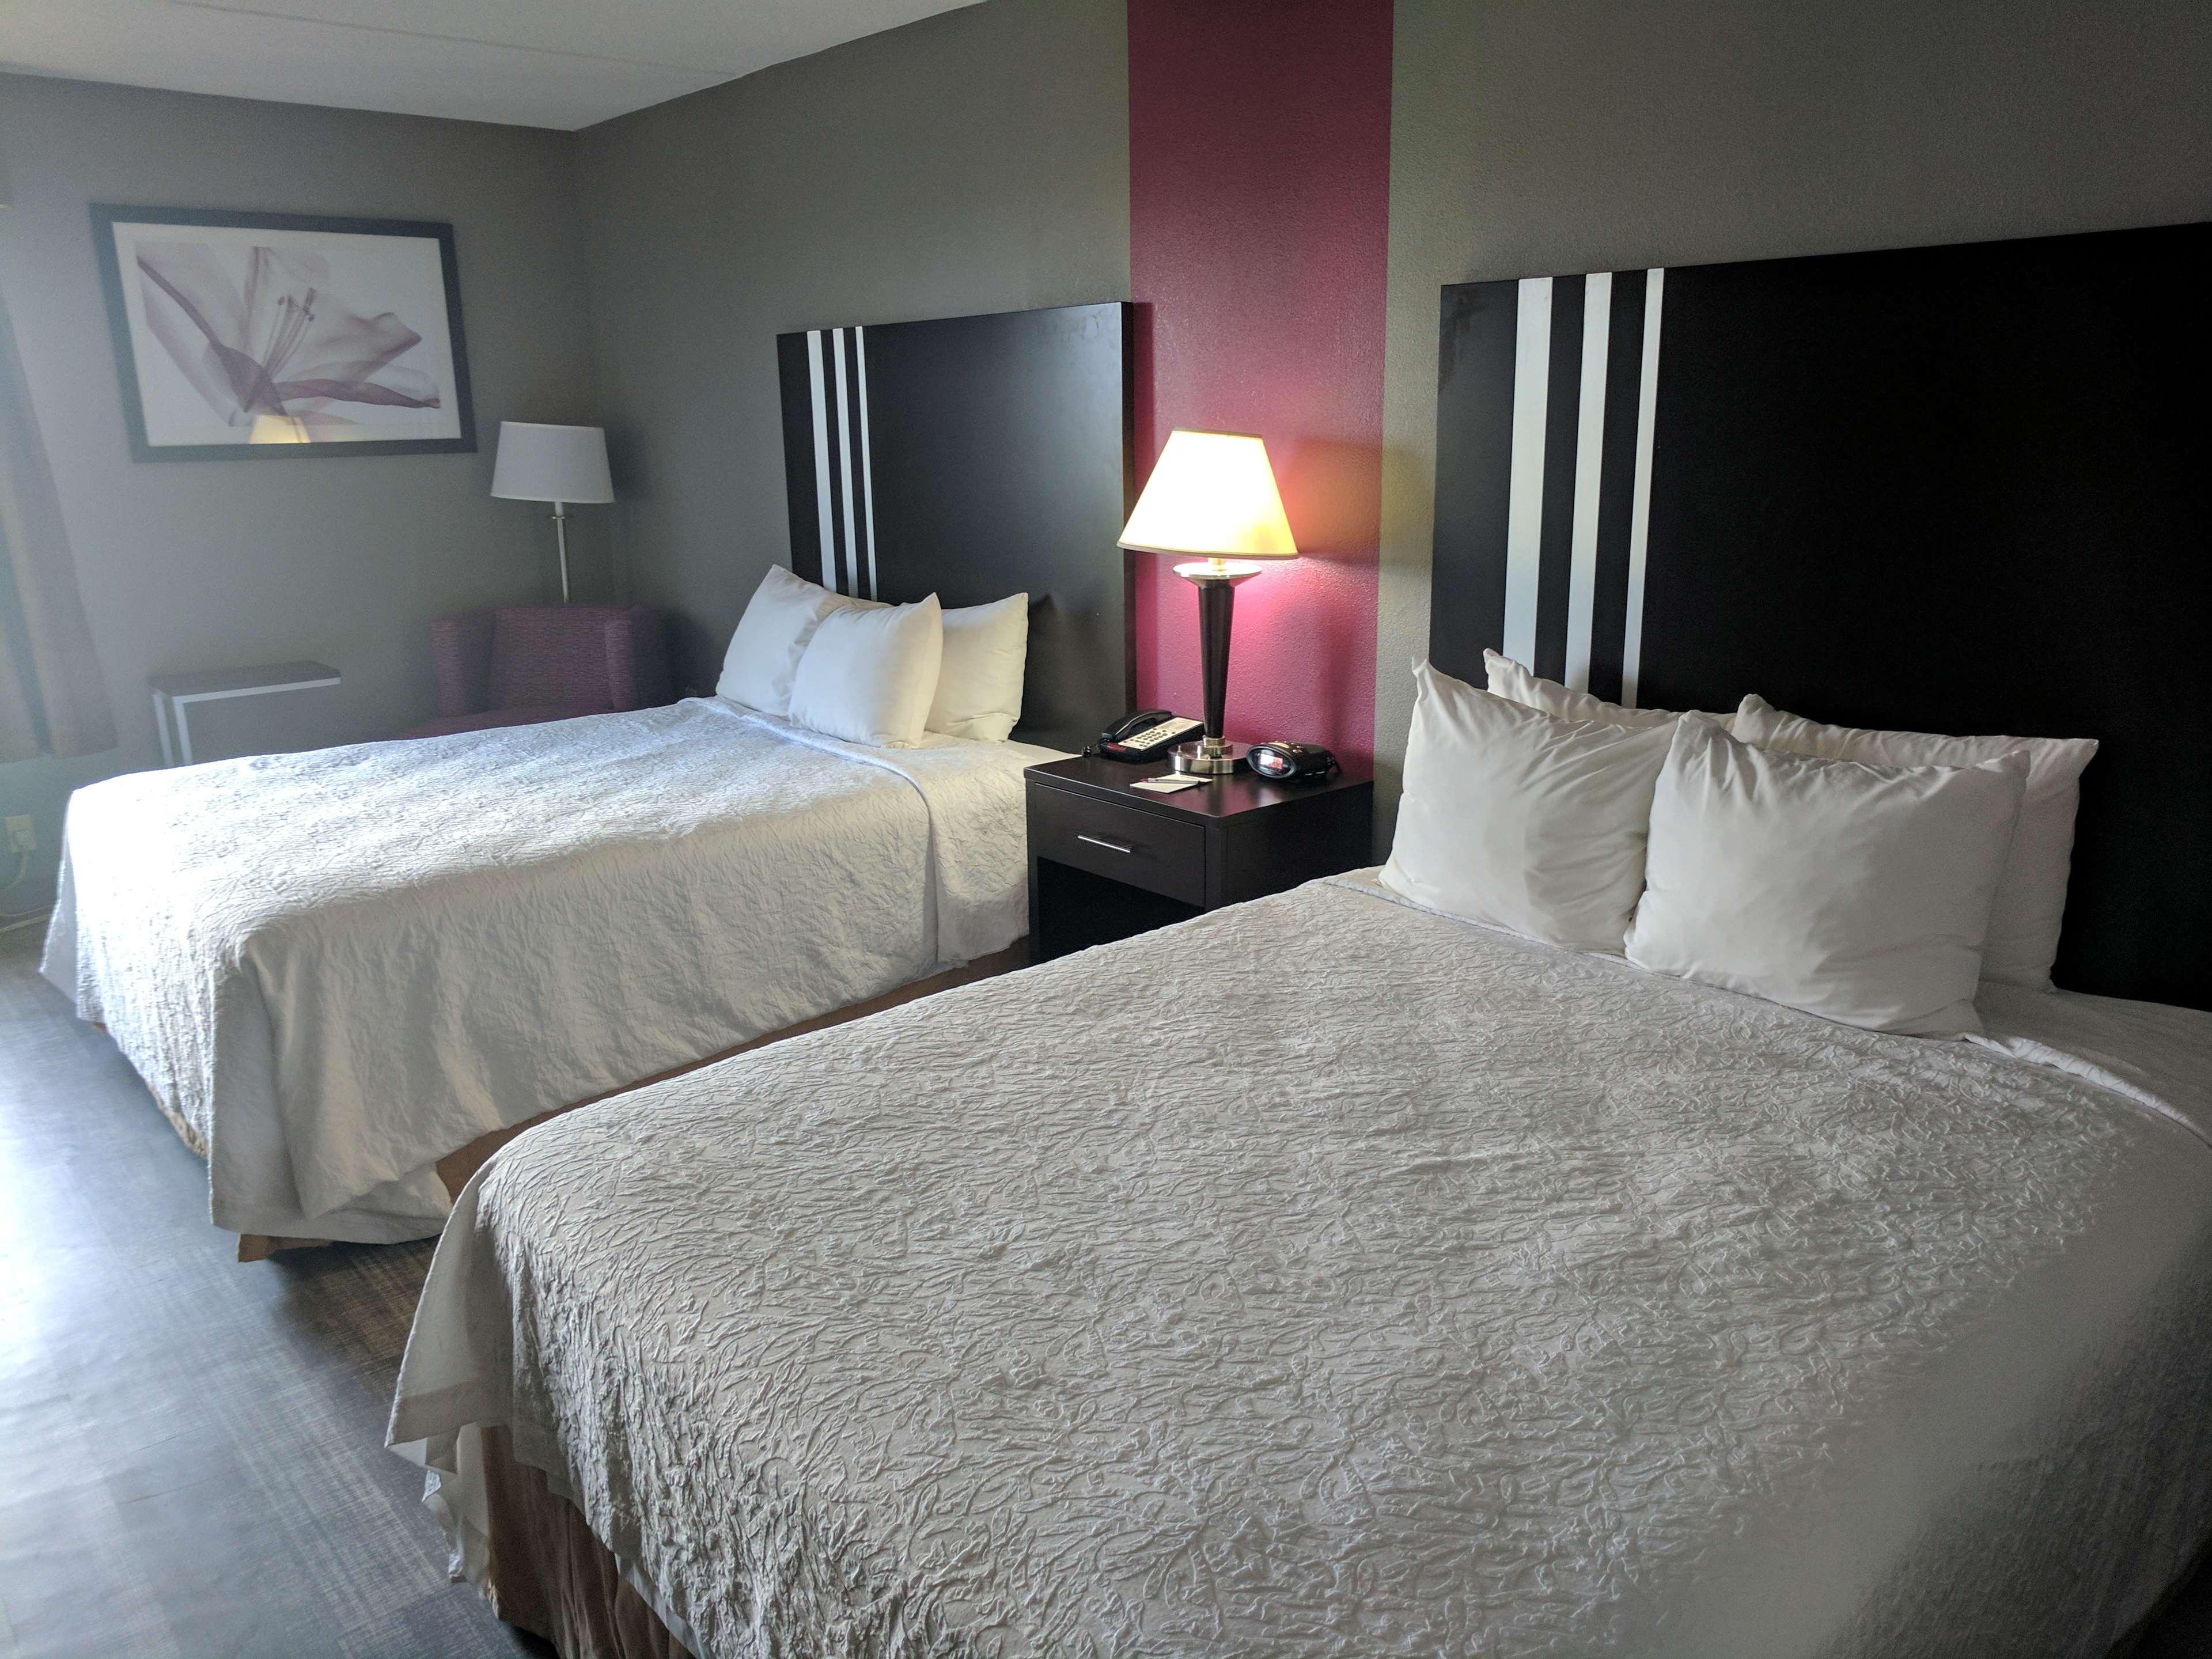 Best Western Plus Greensboro Airport Hotel image 12